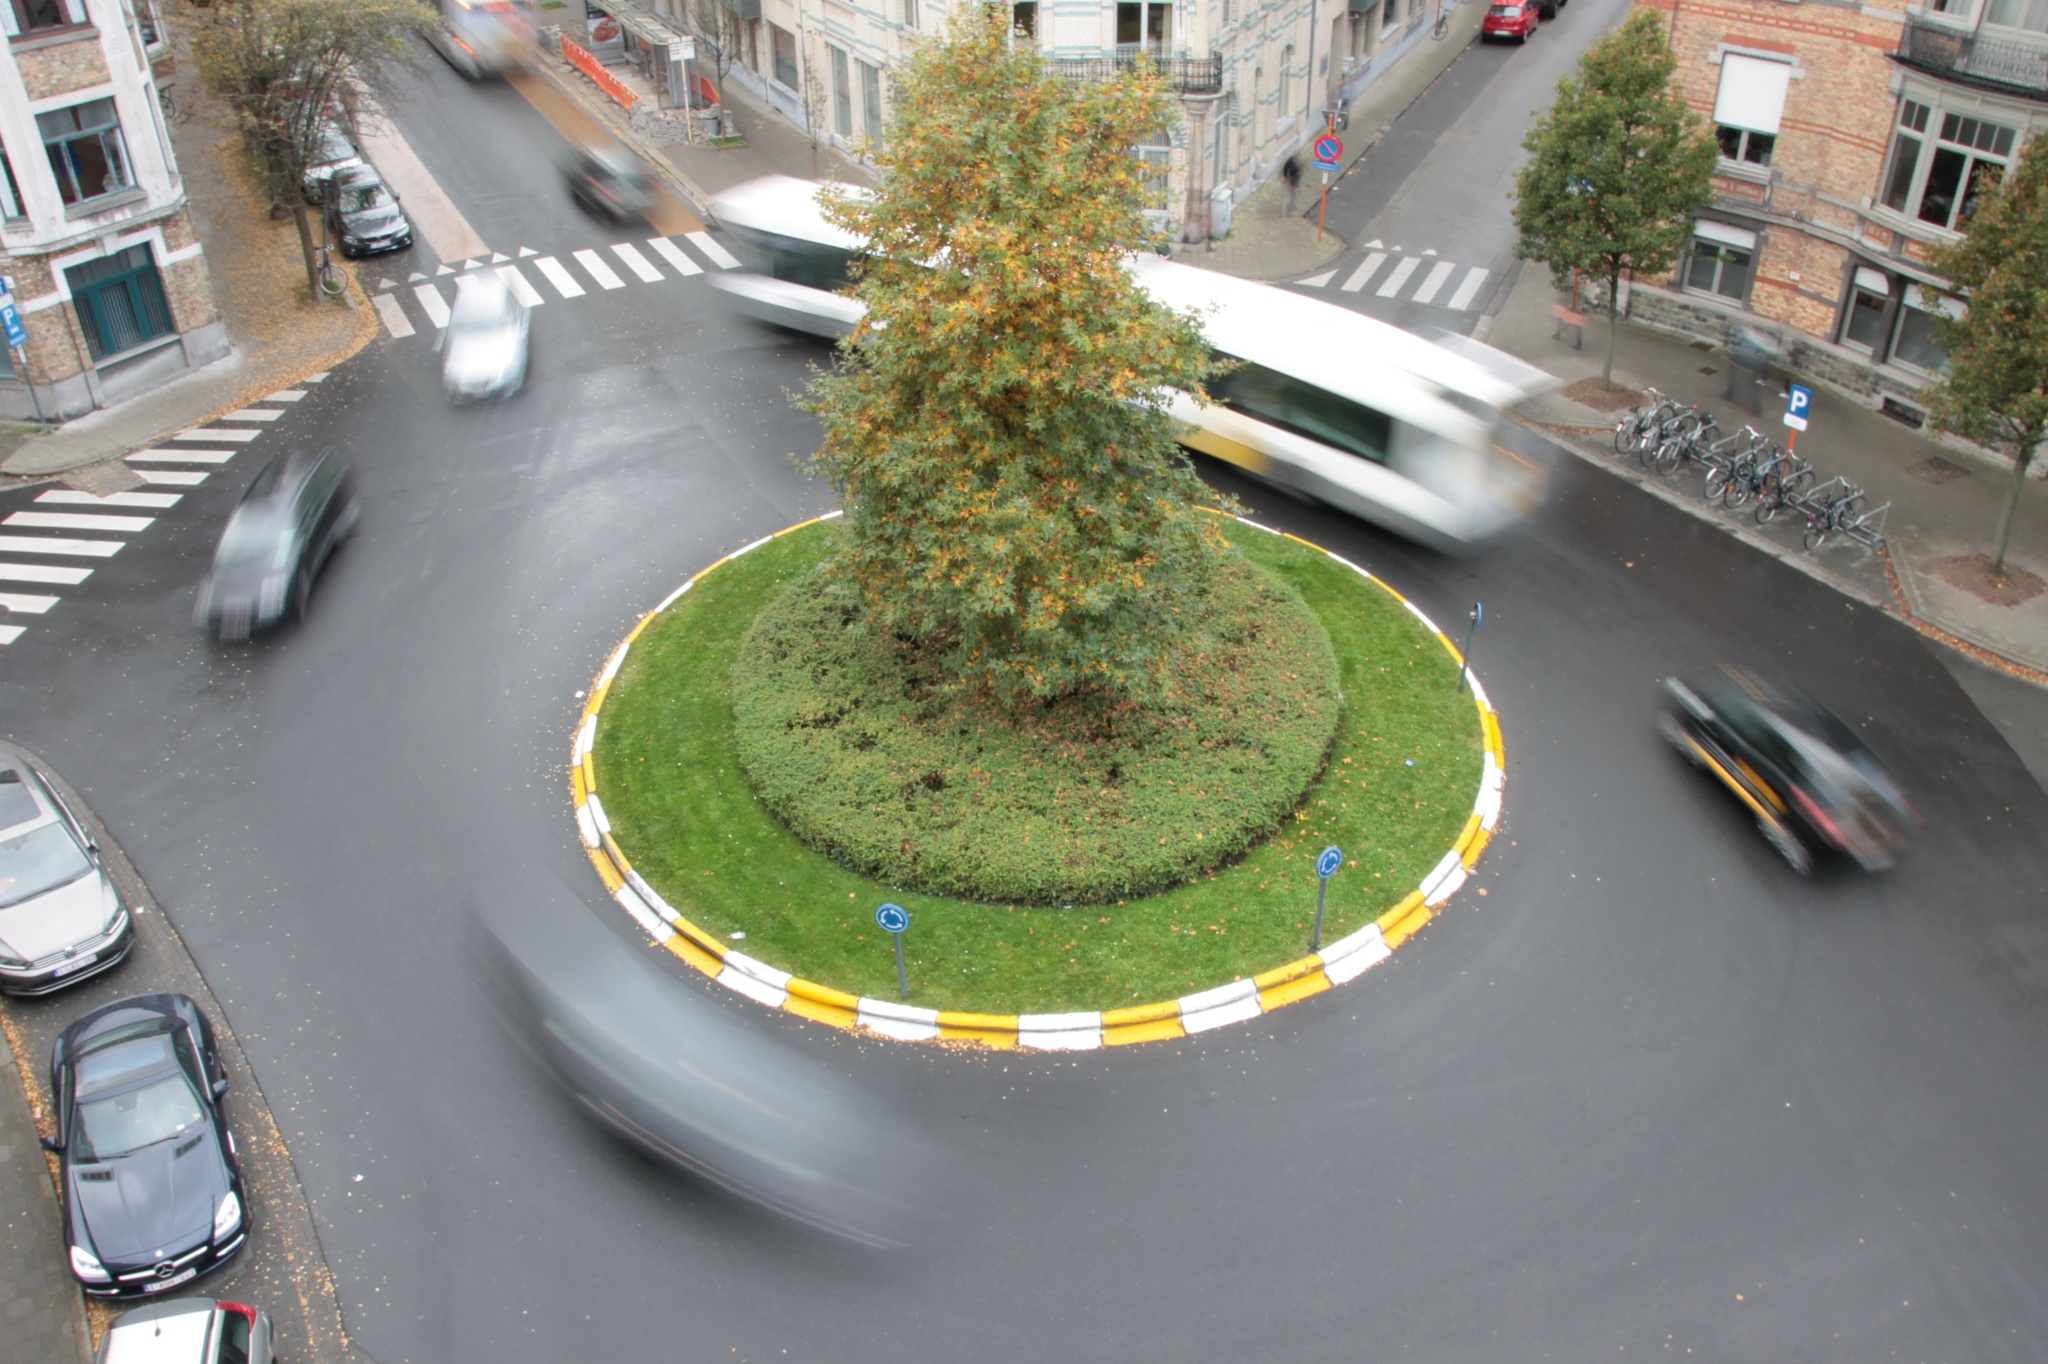 Shutter Roundabout by Linus De Witte